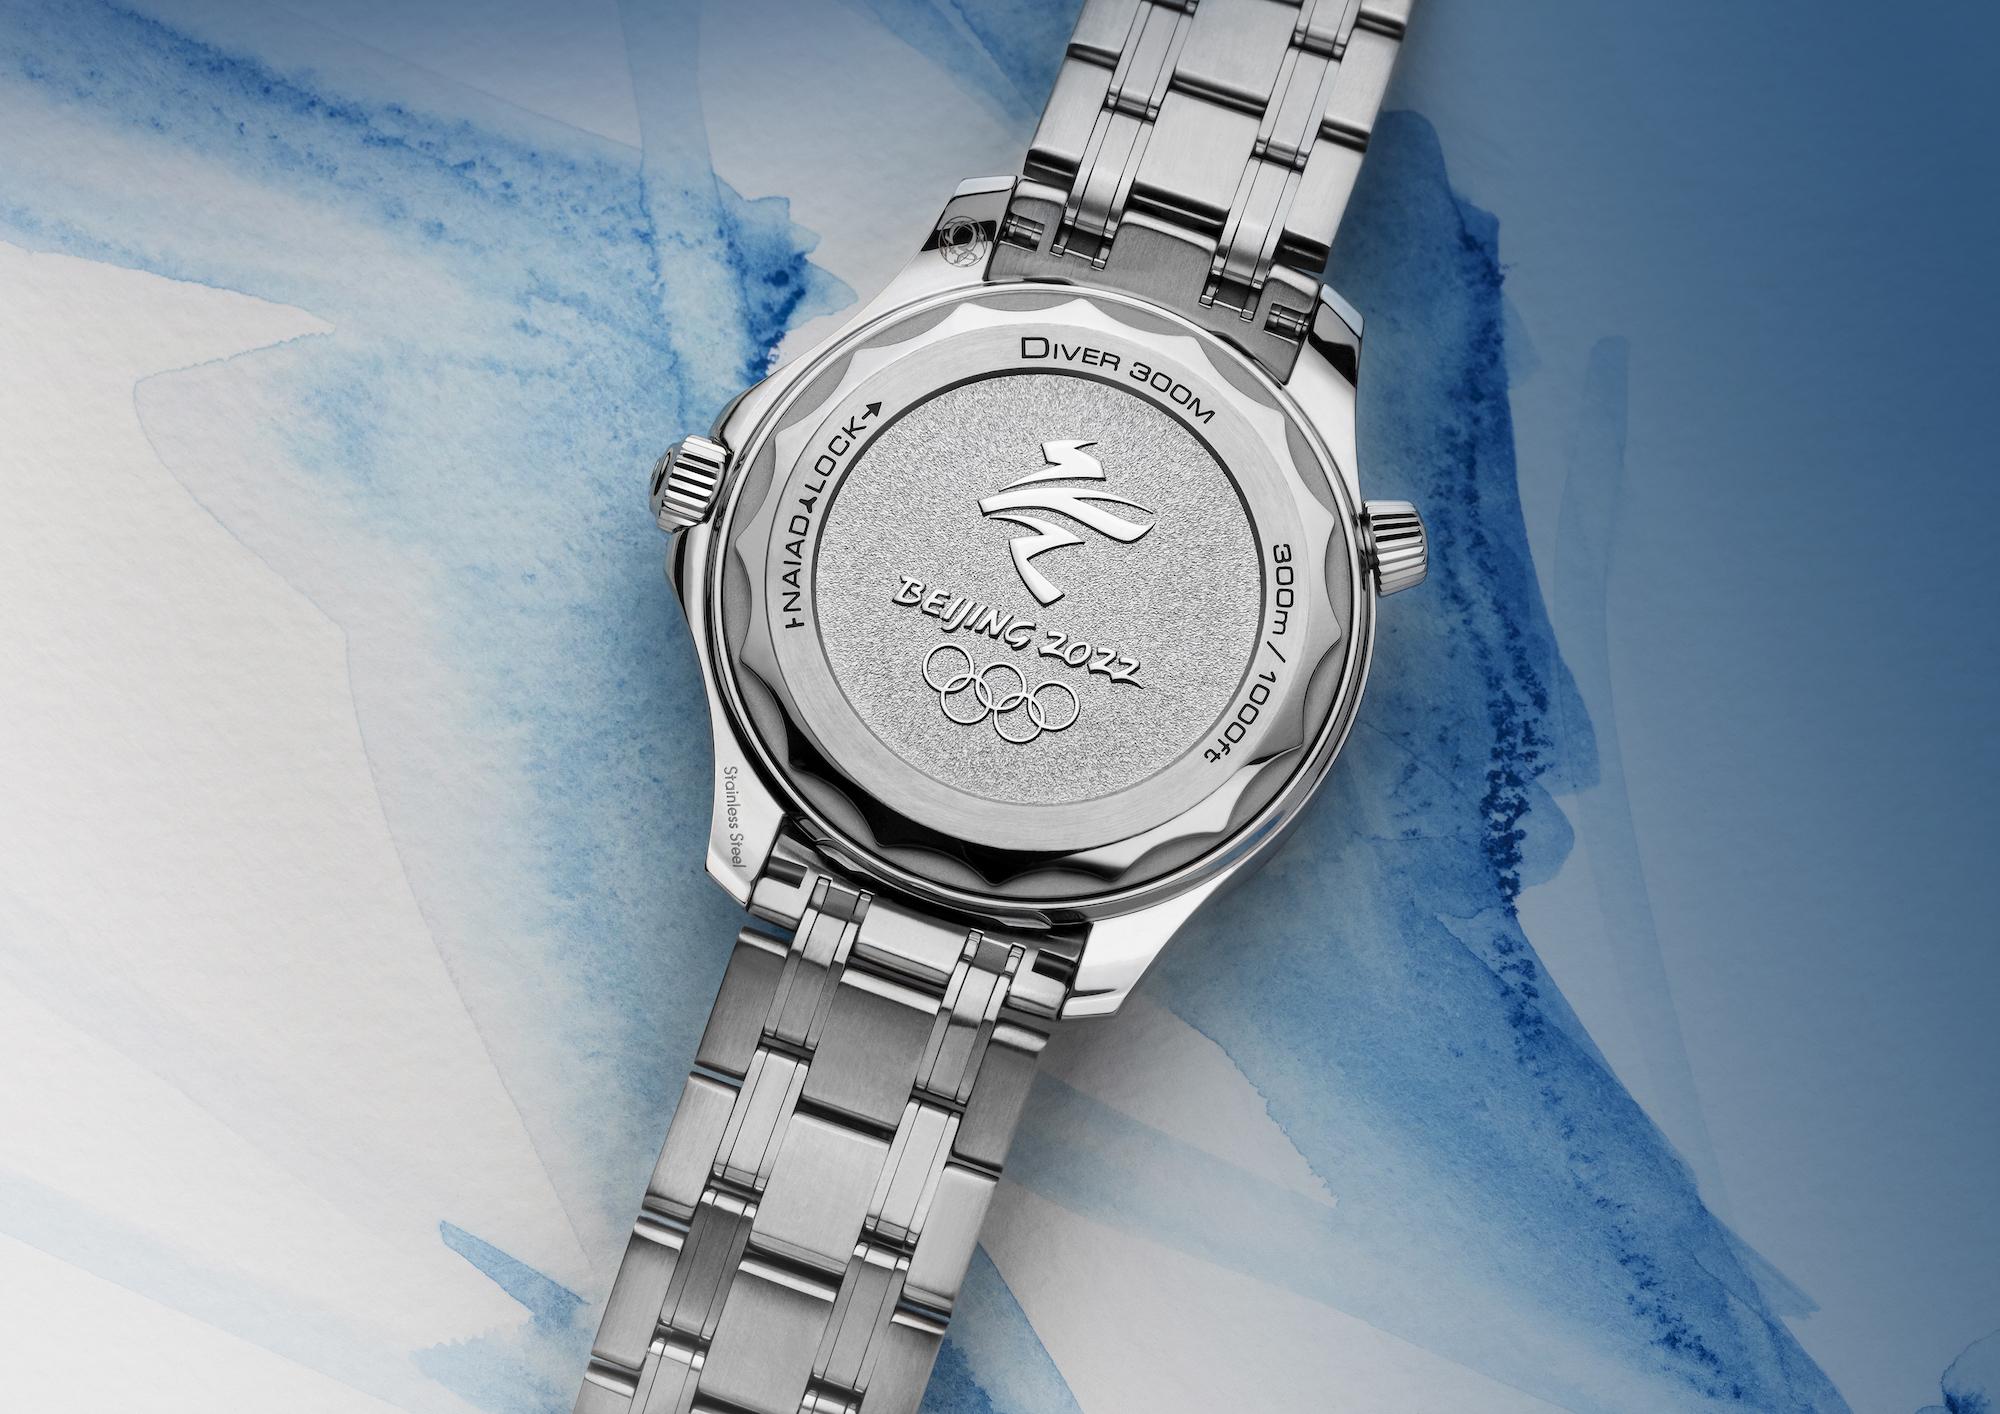 Omega Seamaster Diver 300M Beijing 2022 522.30.42.20.03.001 lifestyle trasera